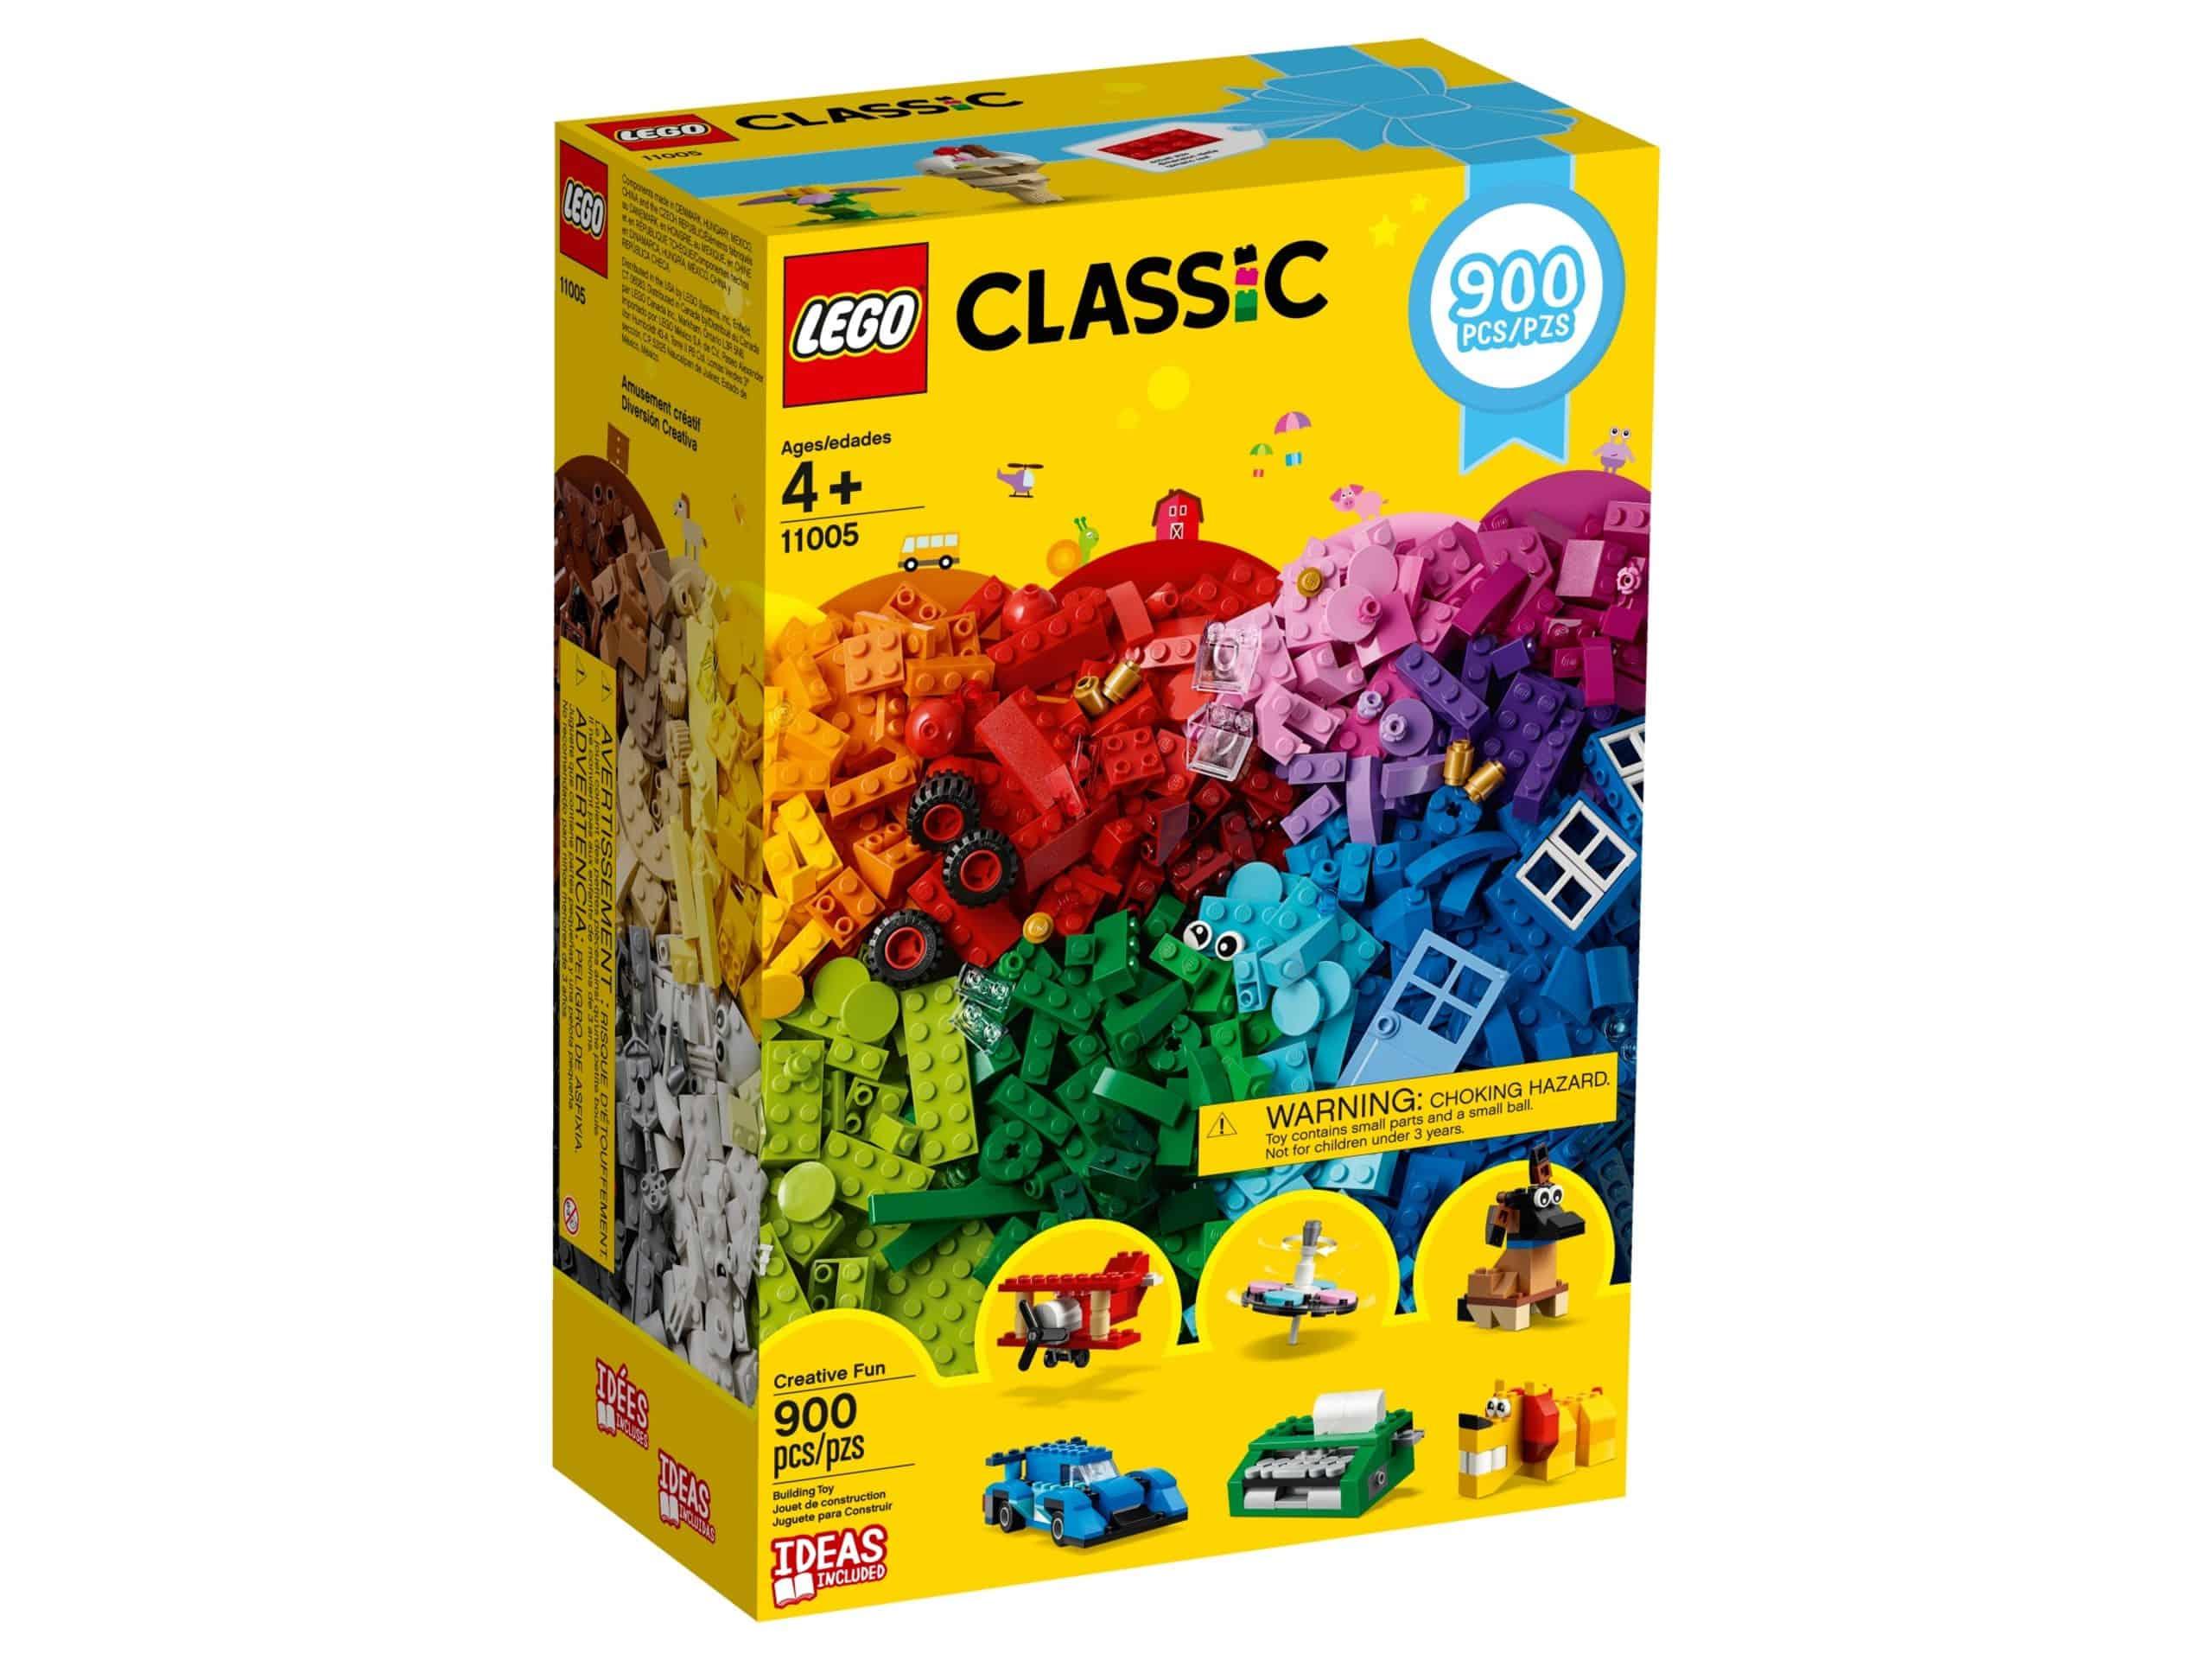 lego 11005 creative fun scaled